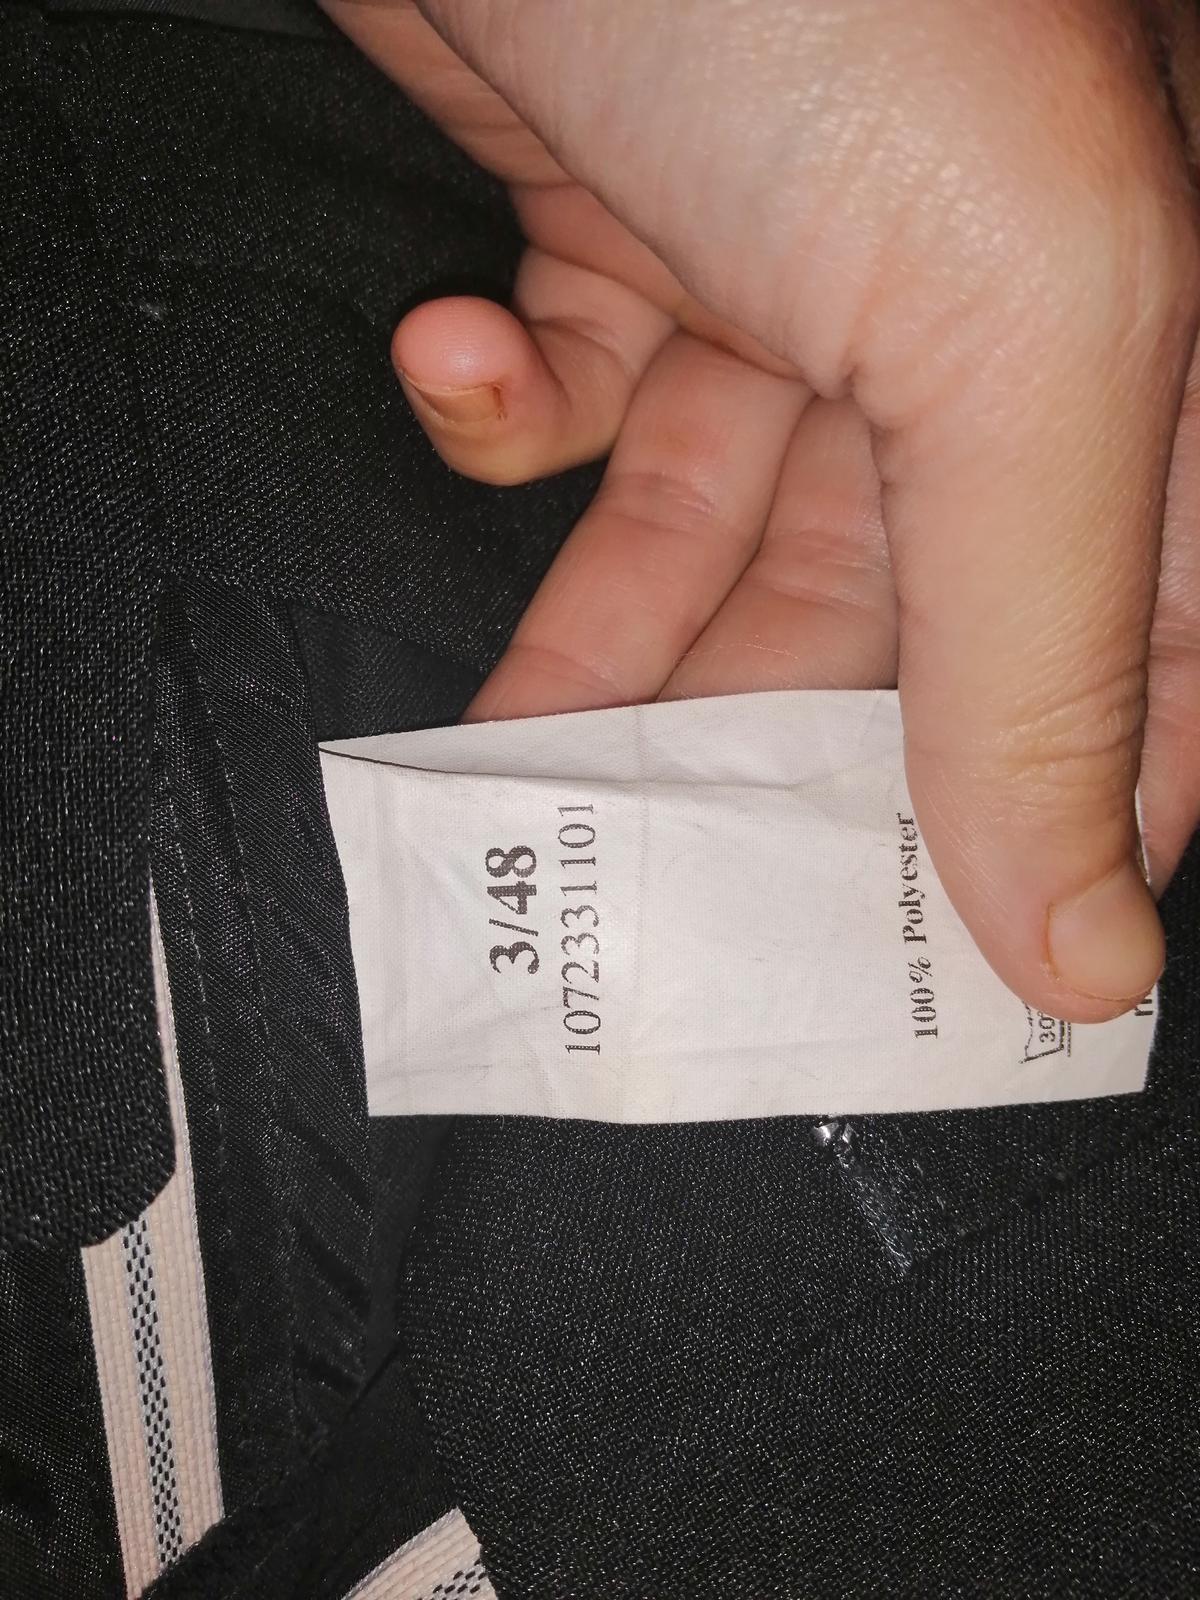 Pánsky oblek - Obrázok č. 2